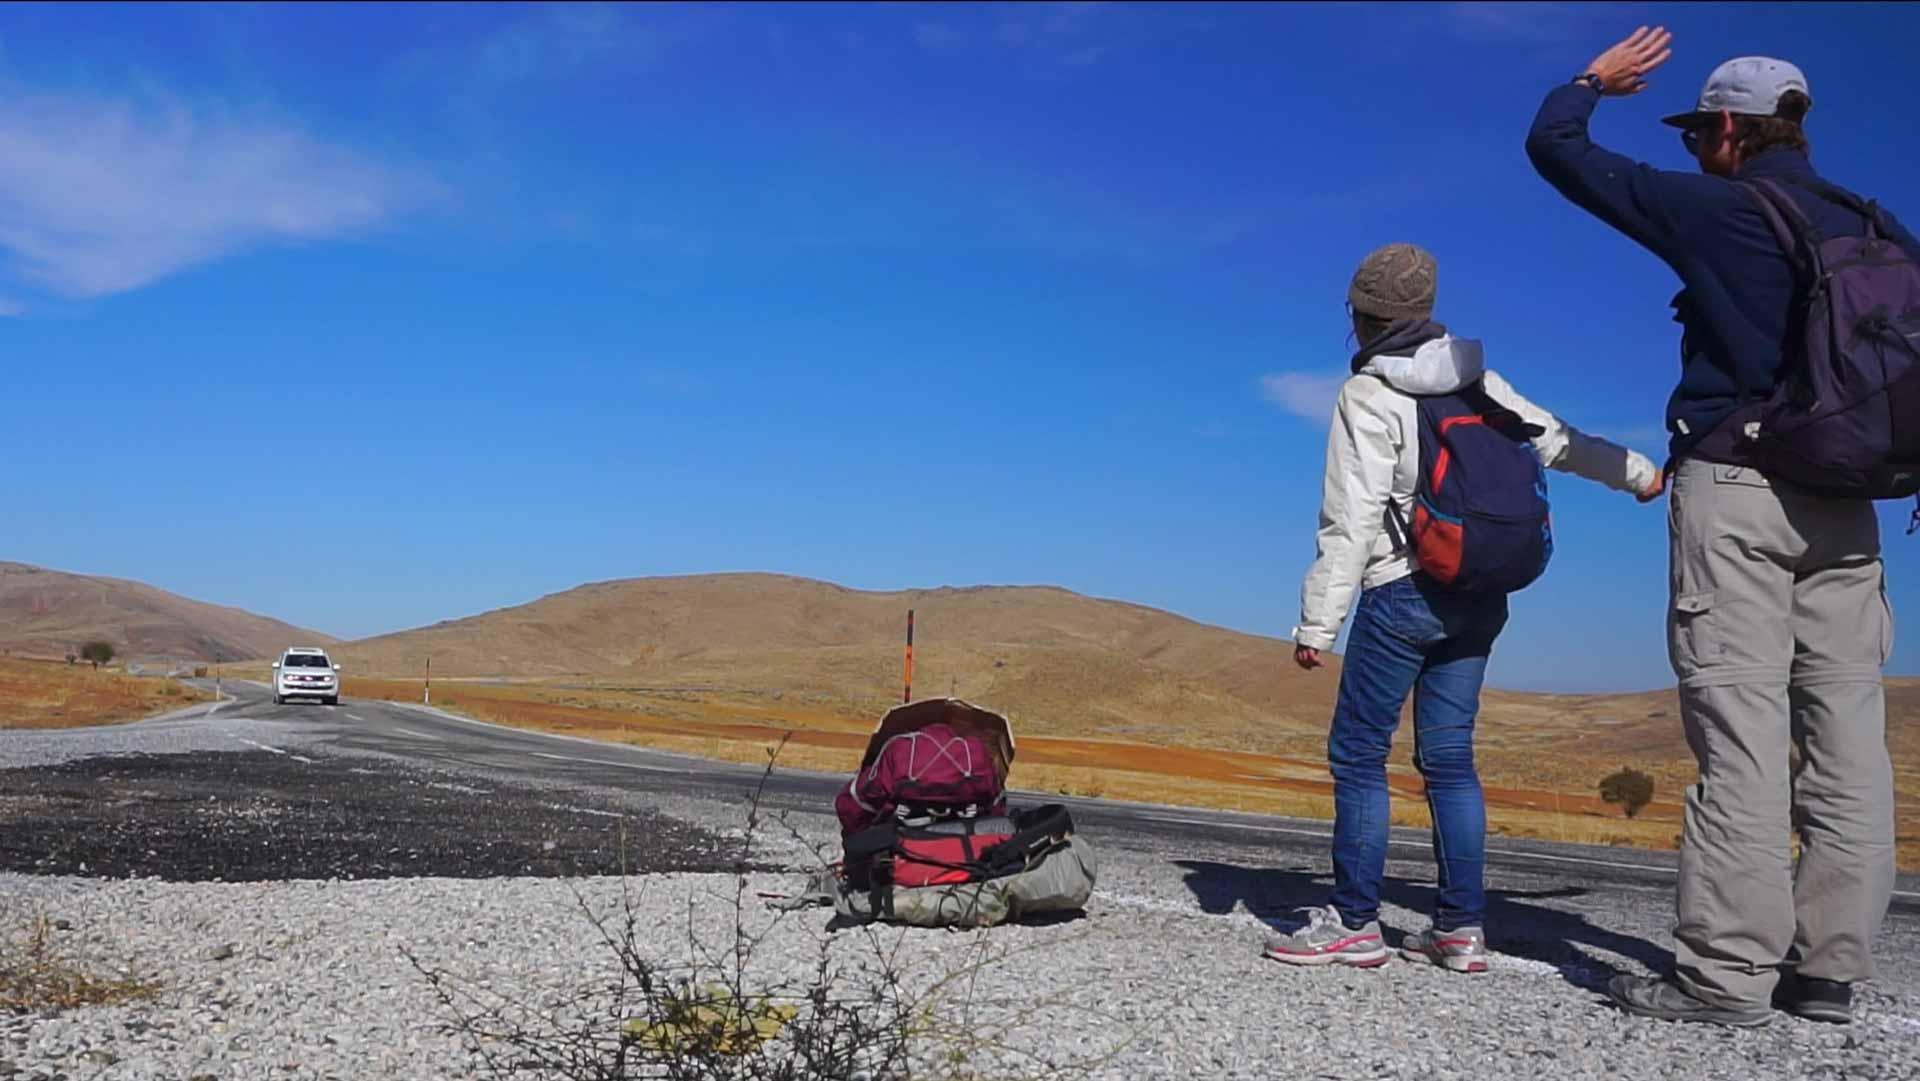 SerialHikers stop autostop world monde tour hitchhiking aventure adventure alternative travel voyage sans avion no fly guide